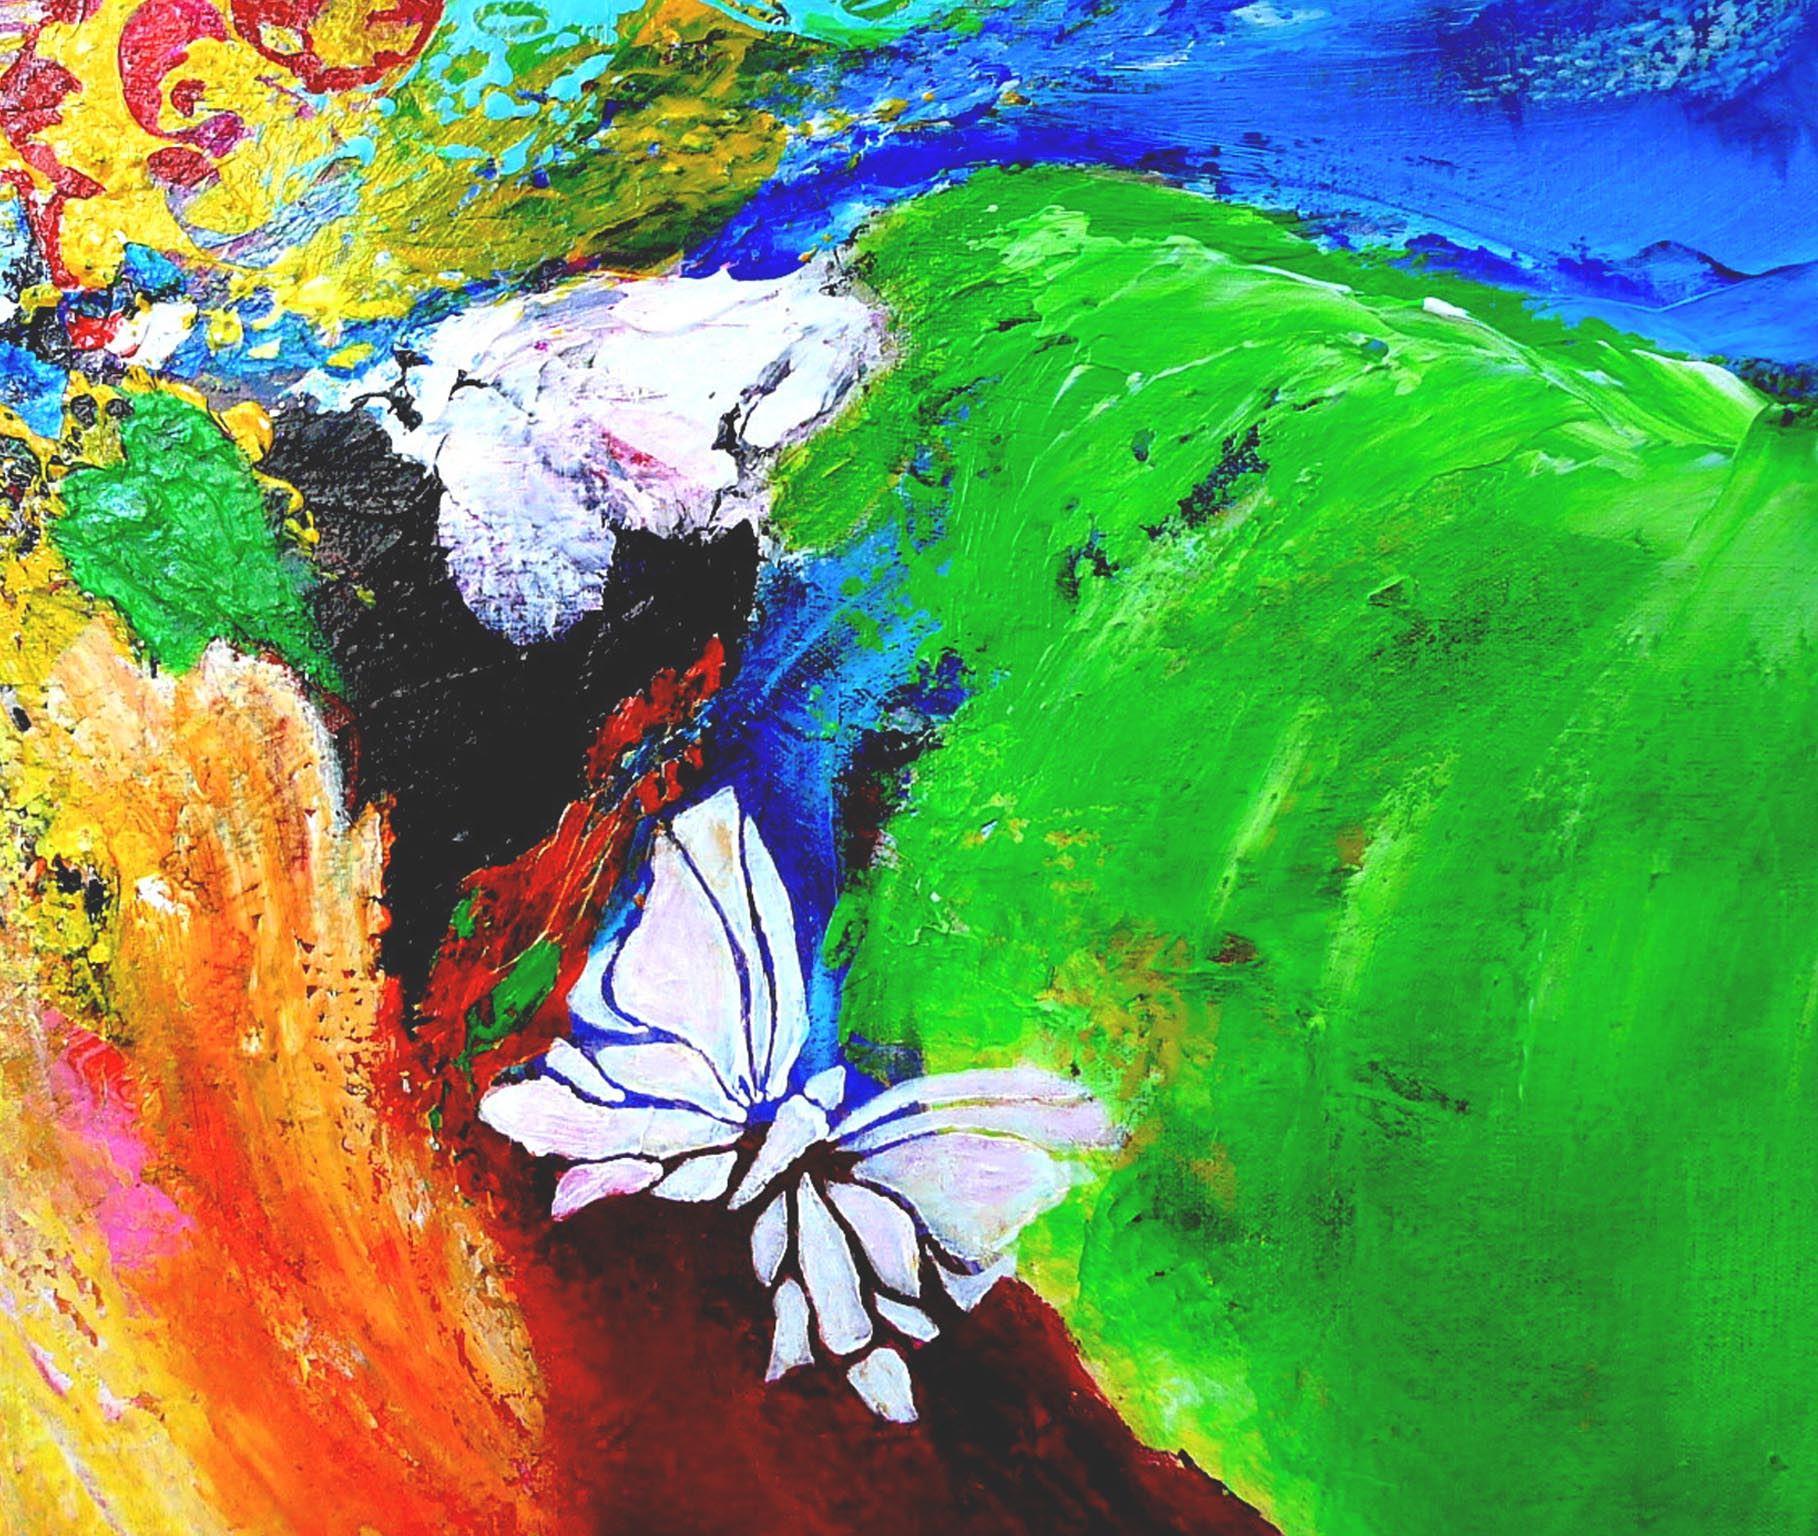 Chaos der Gefühle » Dr. Blanka Mandel | CRELALA Kunst